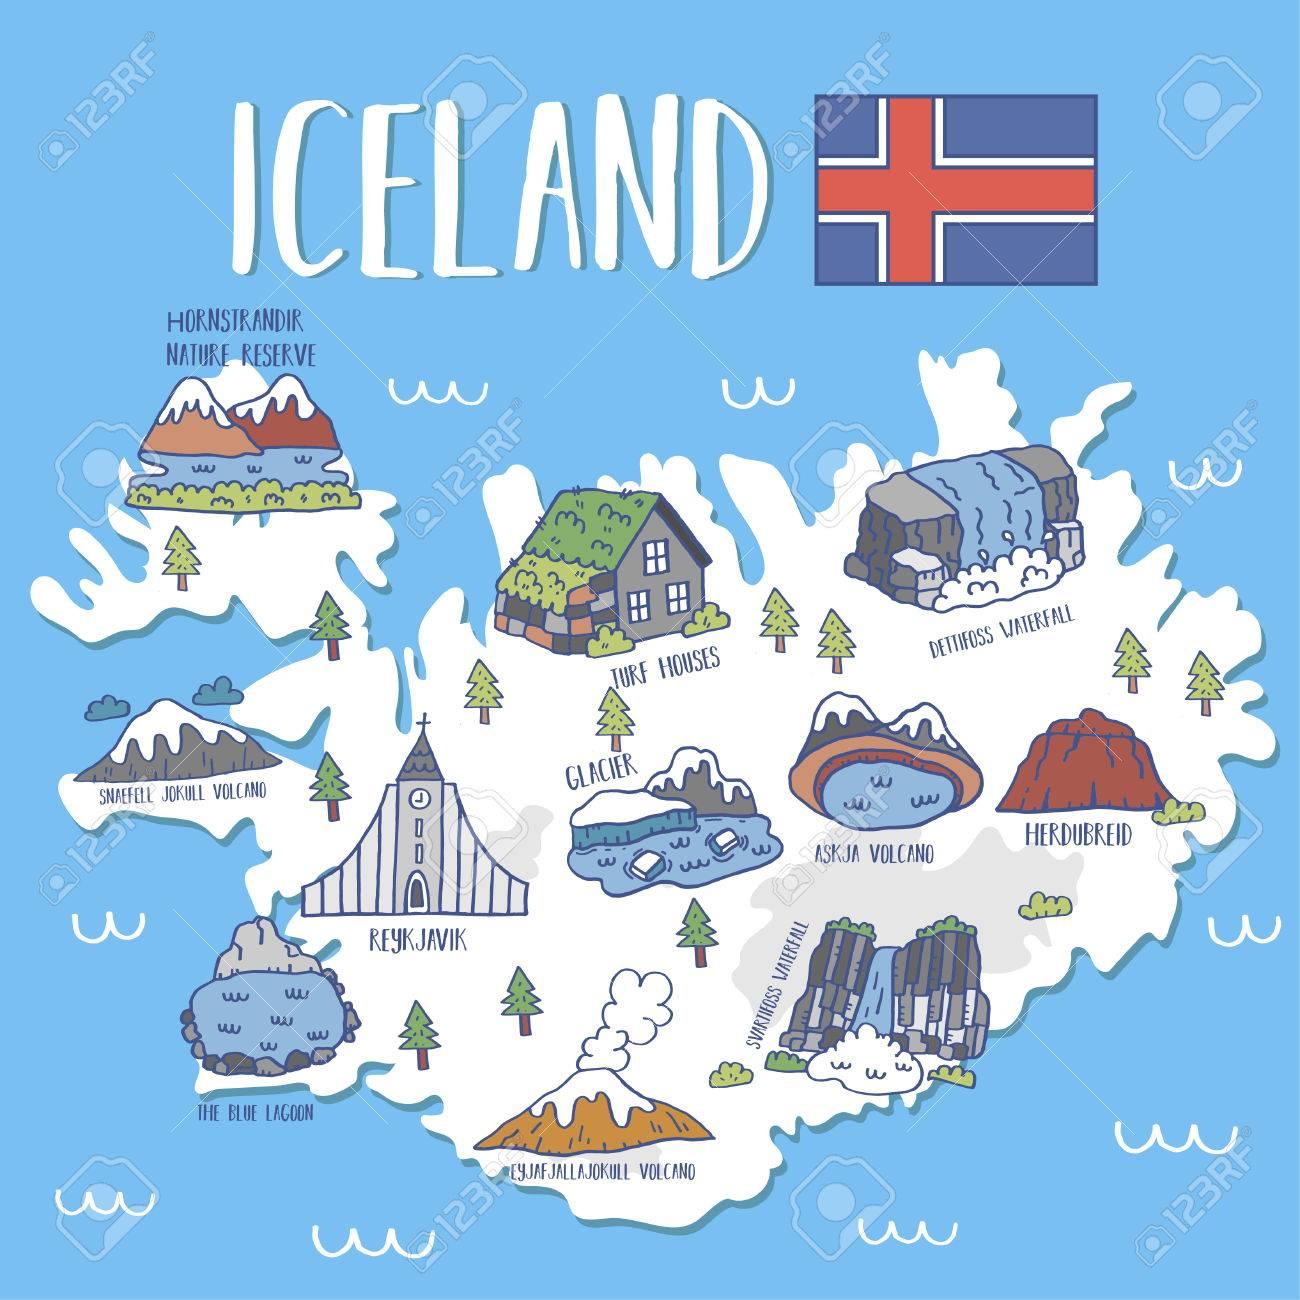 76445440-iceland-travel-map-vector-illustration.jpg